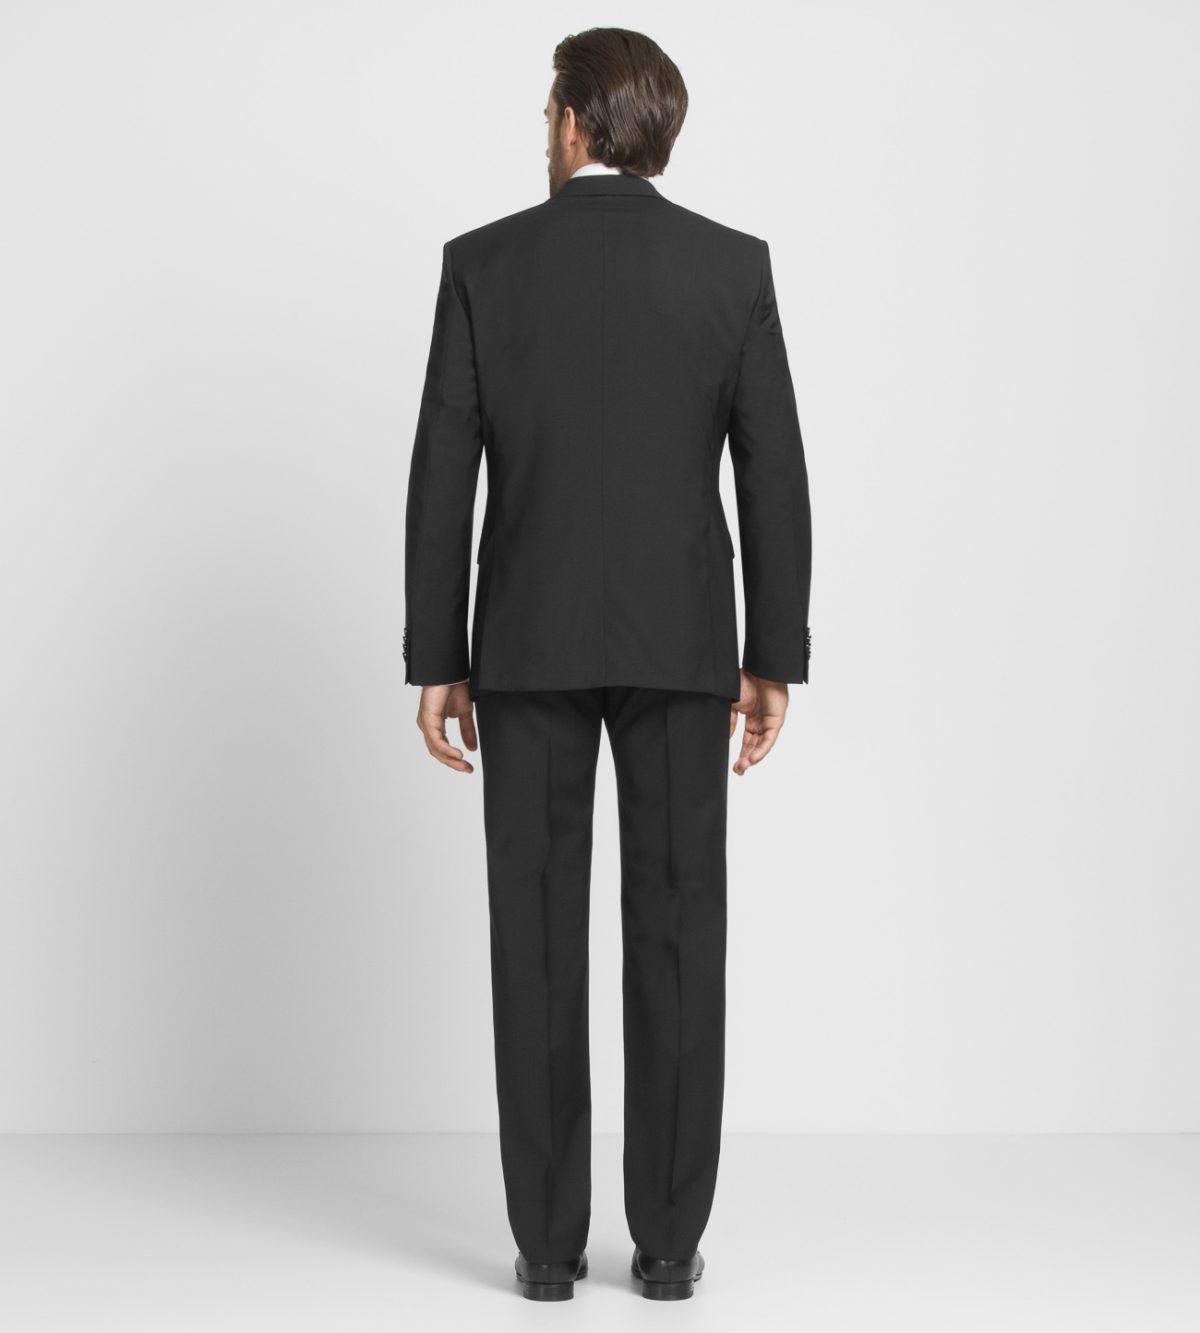 preference-fekete-modern-fit-tiszta-gyapju-oltony-duncan-amf-per-99832-10